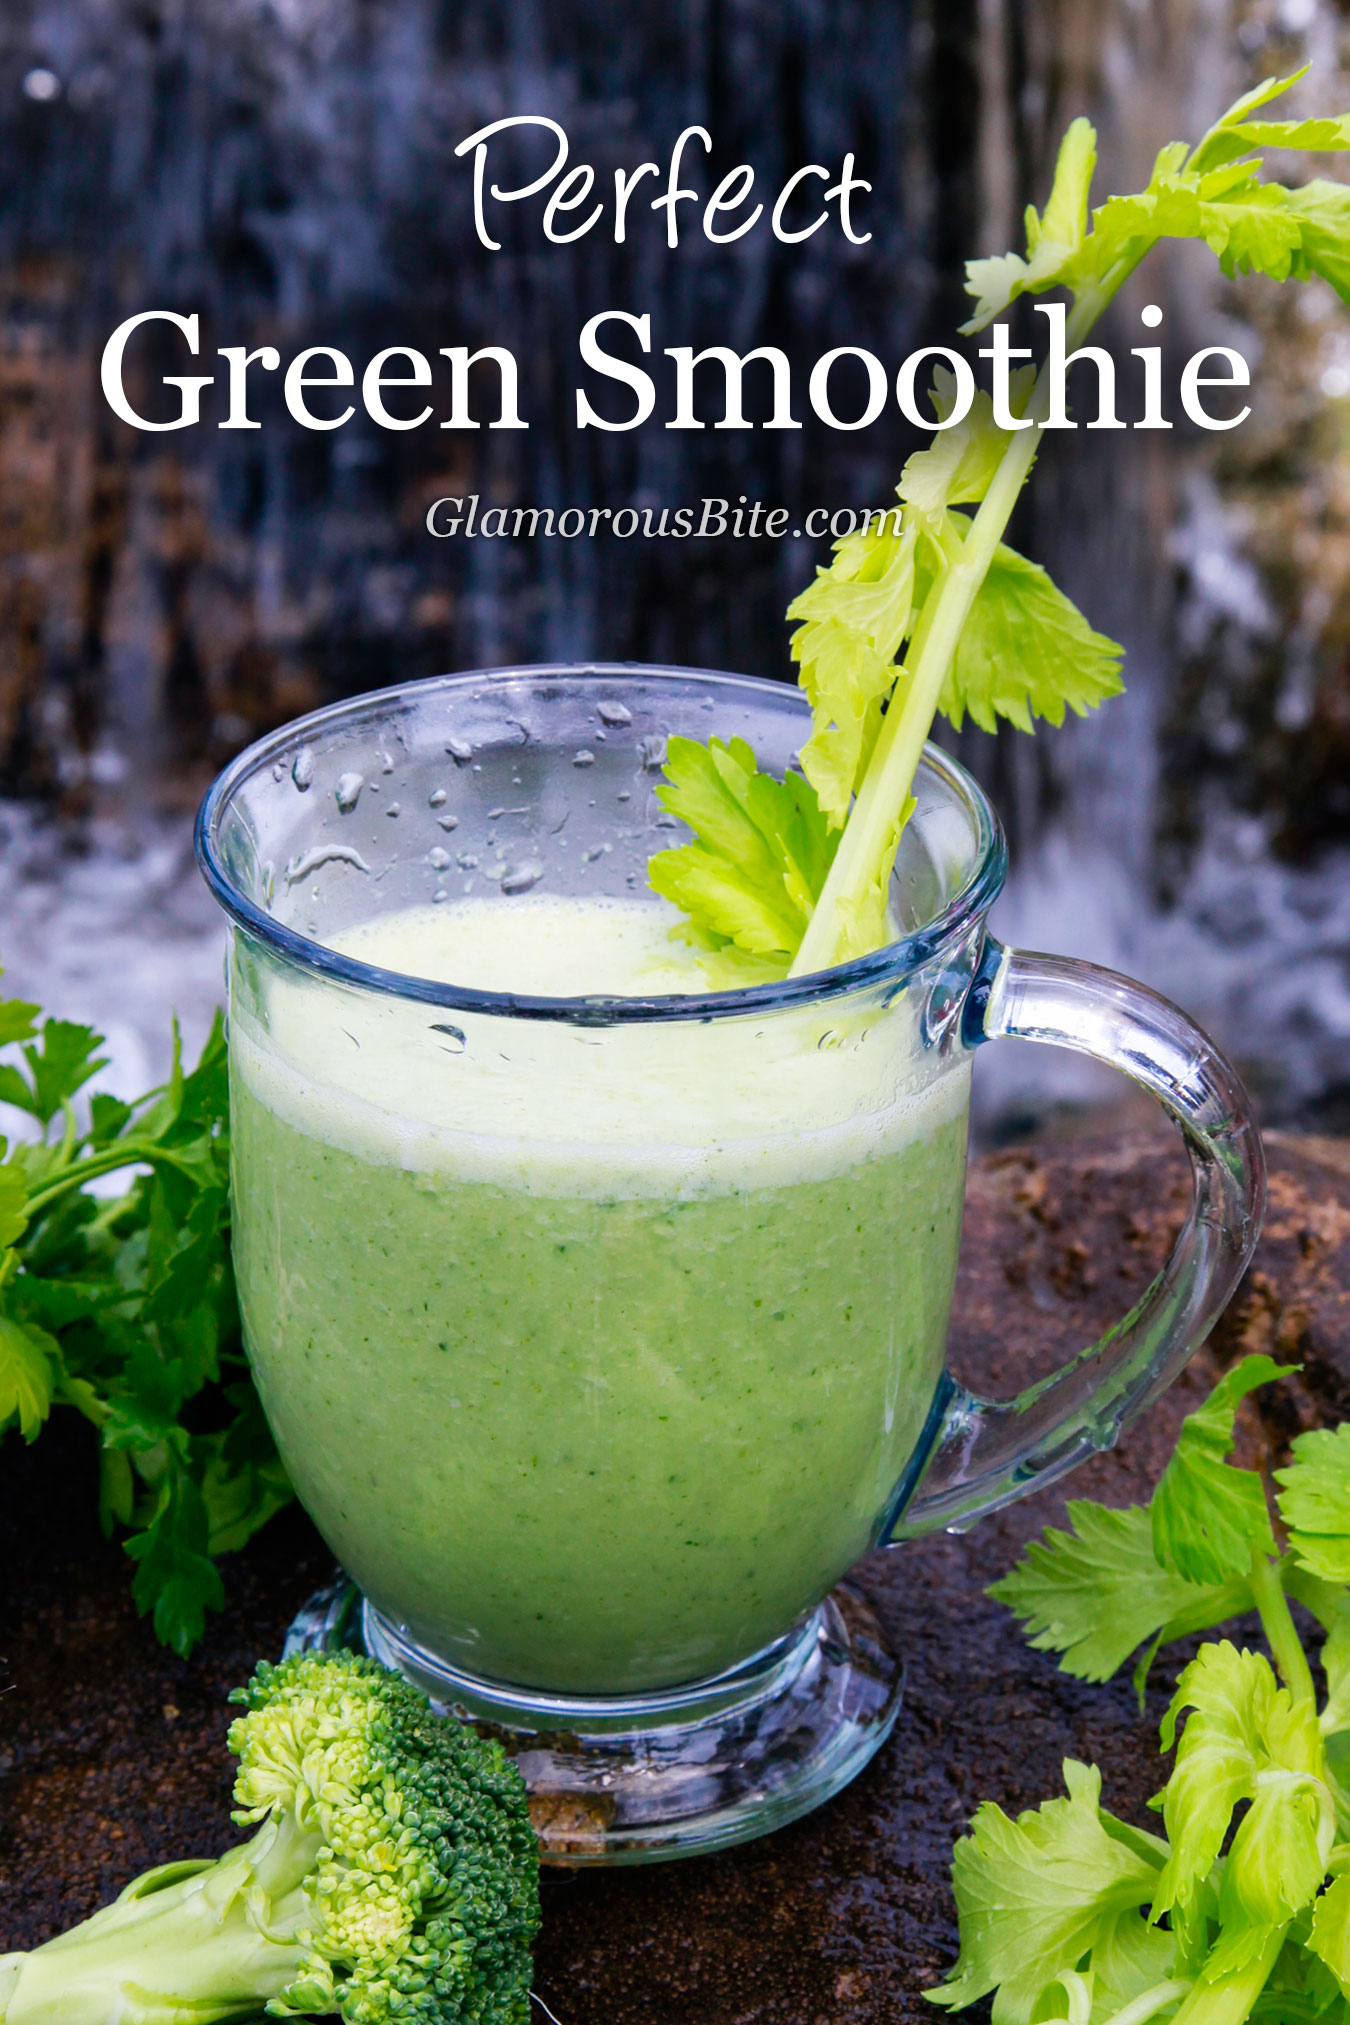 Perfect Green Smoothie Recipe from GlamorousBite